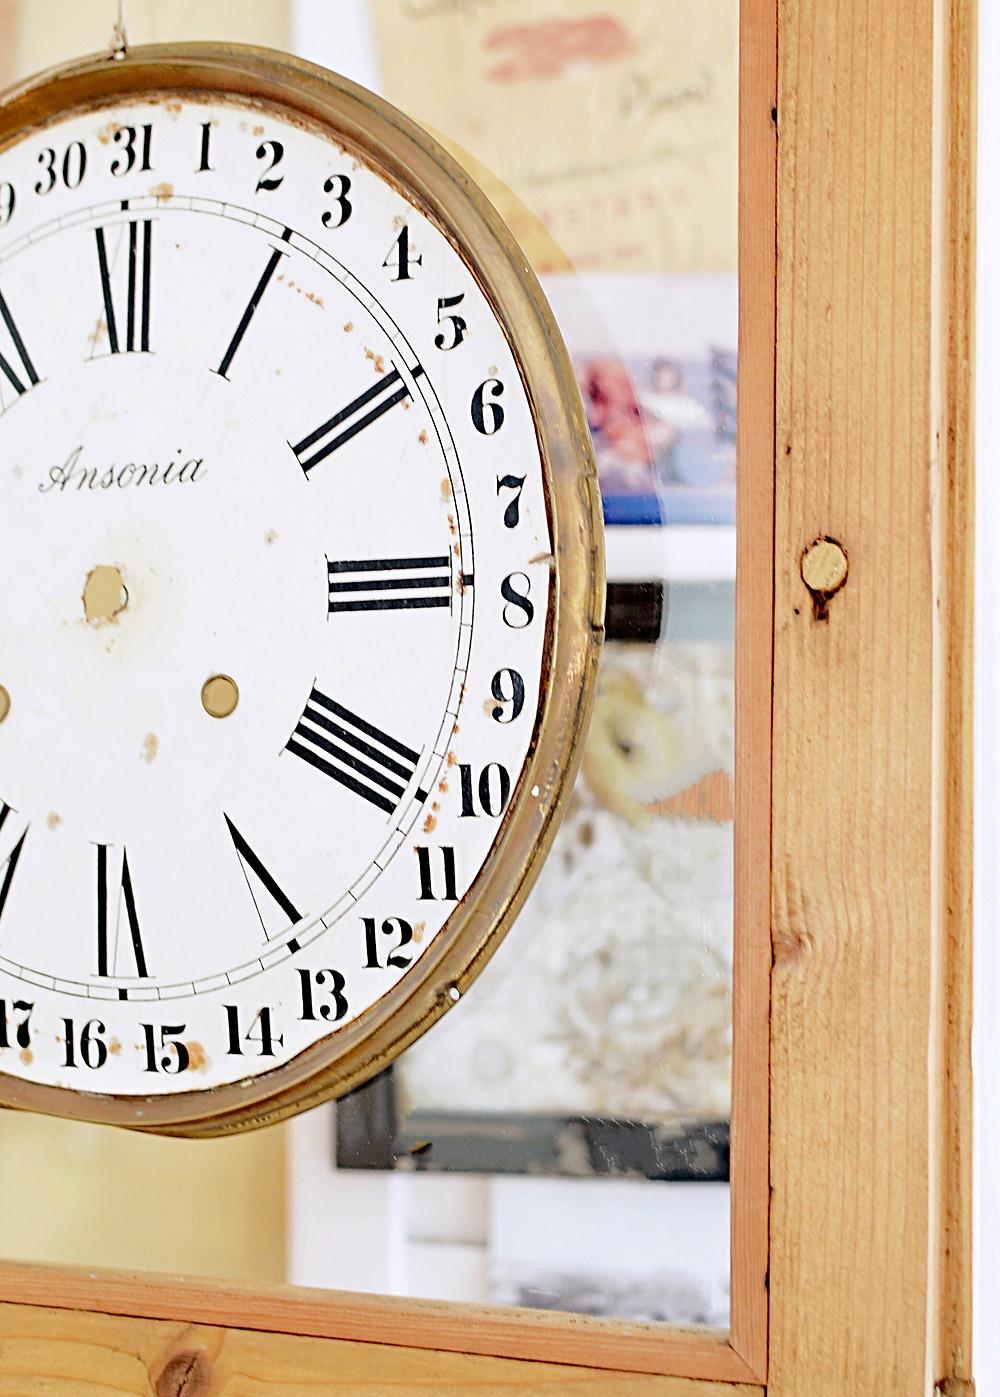 Vintage clock face on glass door on wooden vintage hutch.